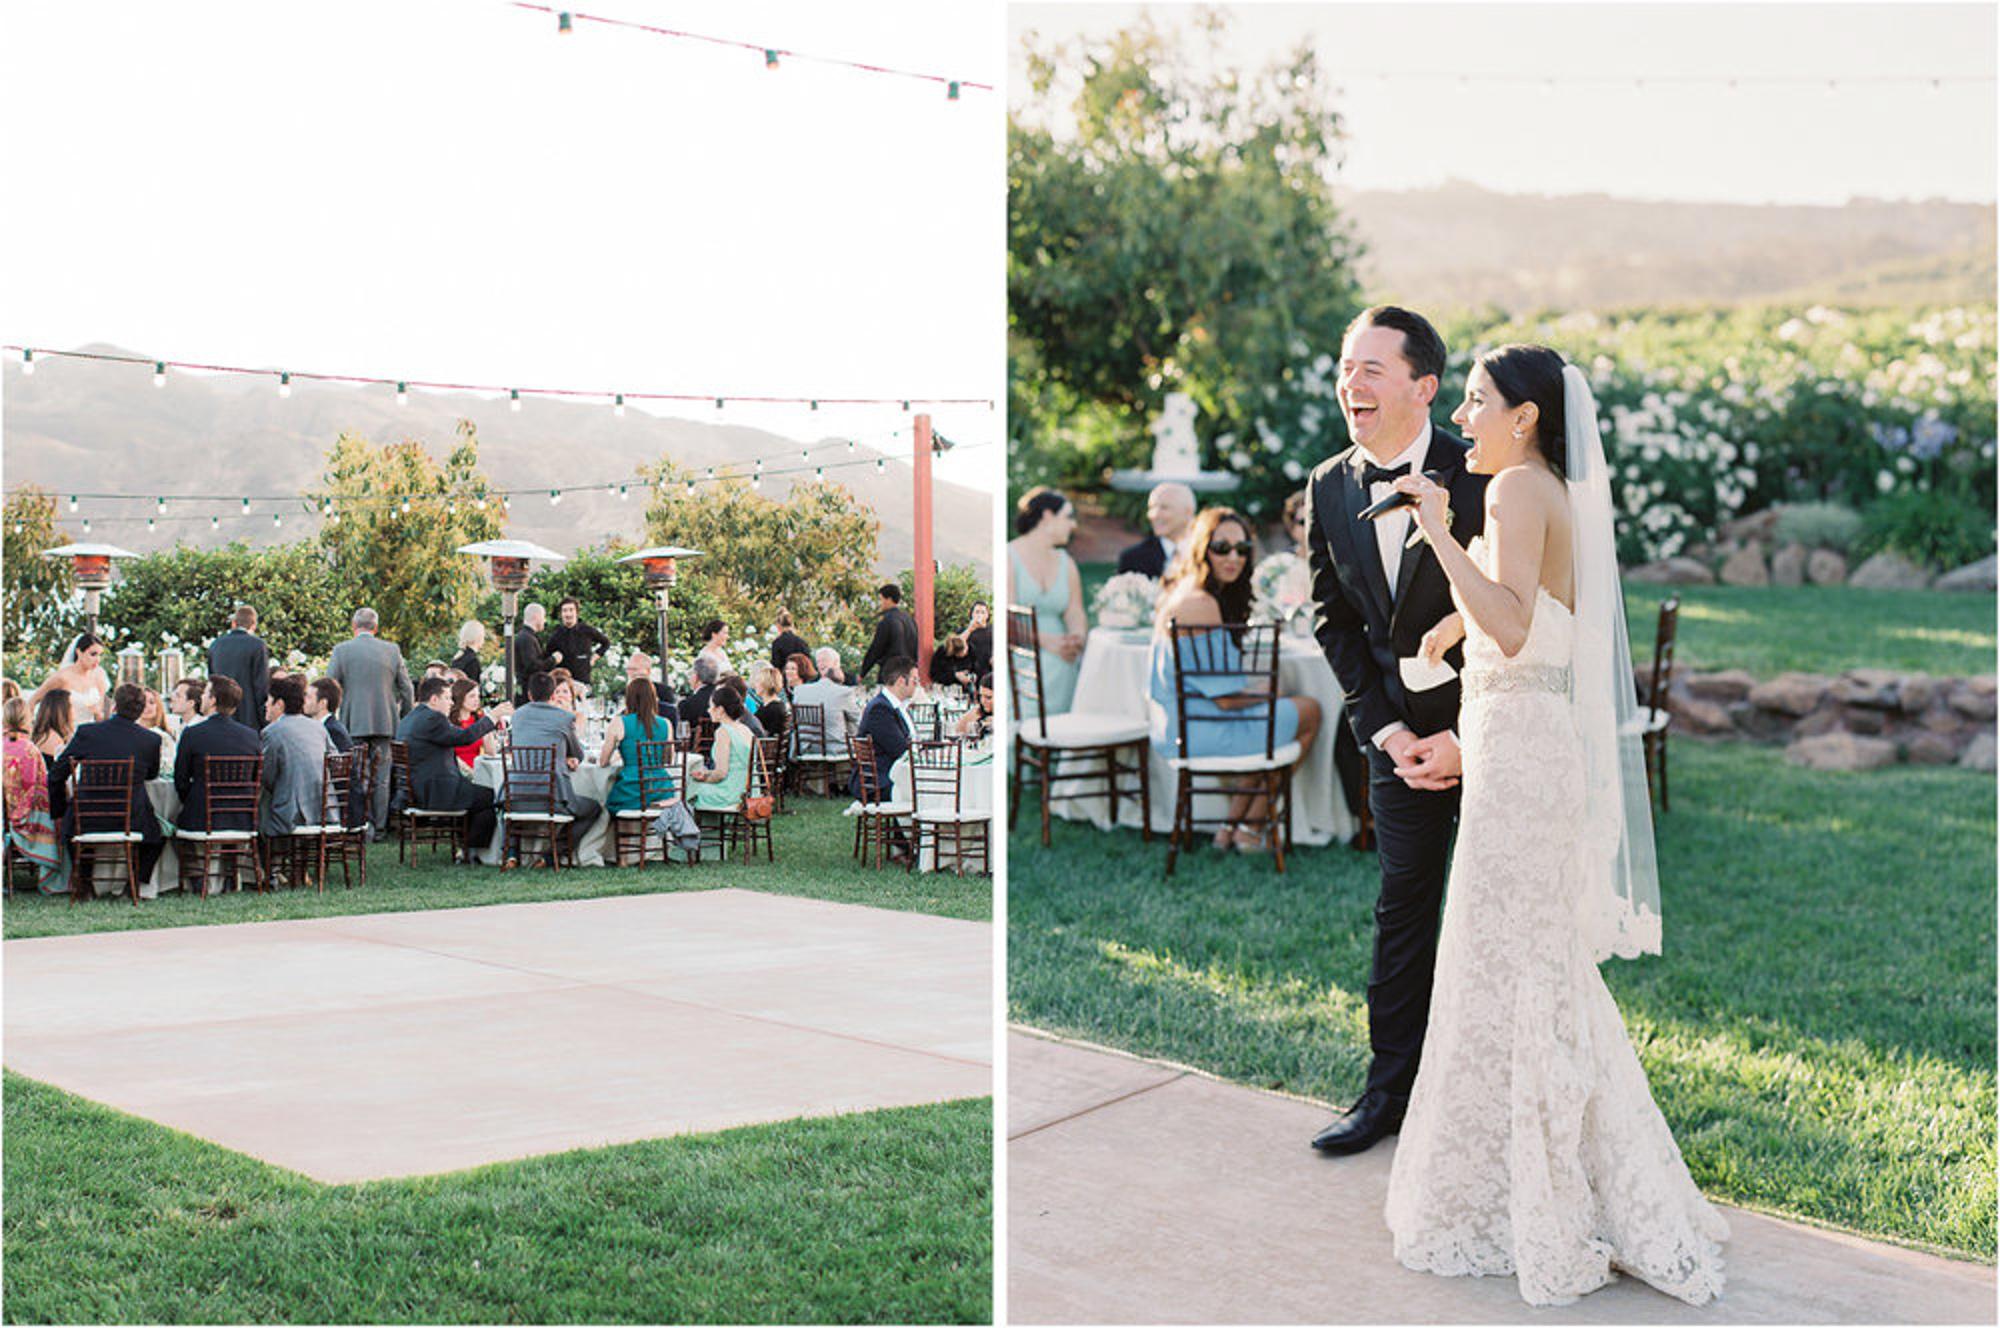 Gerry-Ranch-Wedding-Photography-Kristina-Adams-24.jpg